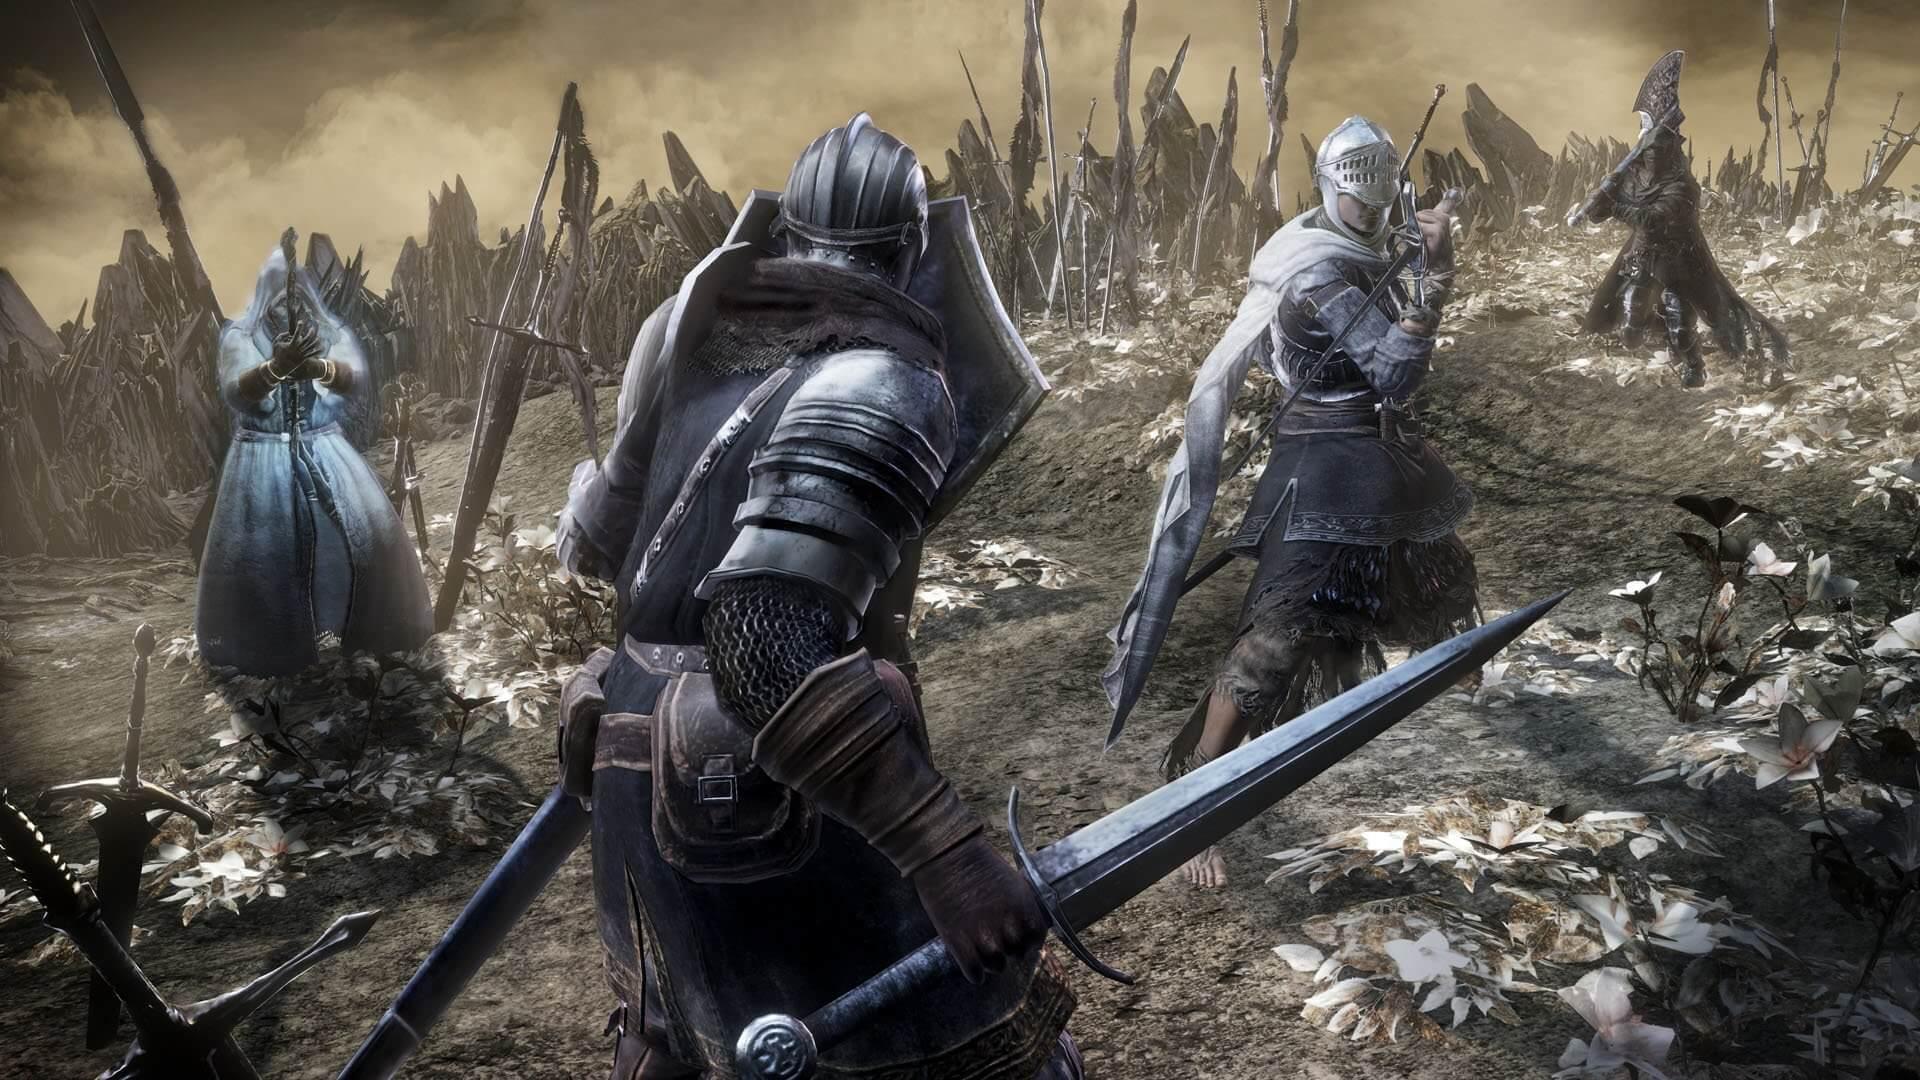 Drak Souls 3 9 - Dark Souls 2 e 3 potrebbero arrivare su Nintendo Switch